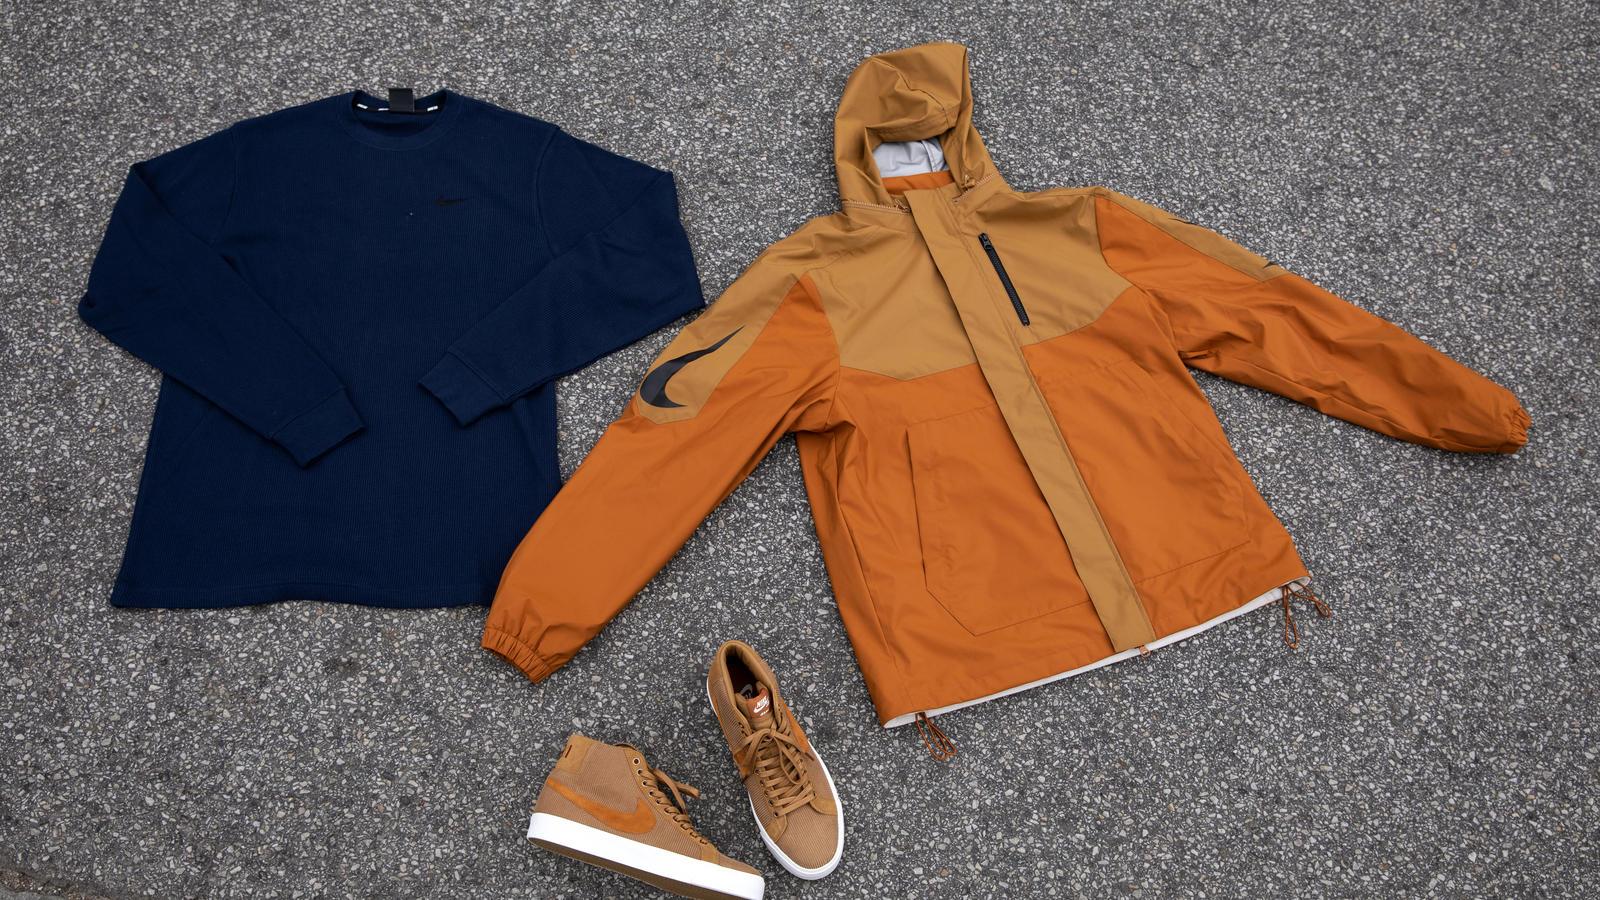 Nike SB Oski Orange Label Collection SB Blazer SB Dunk